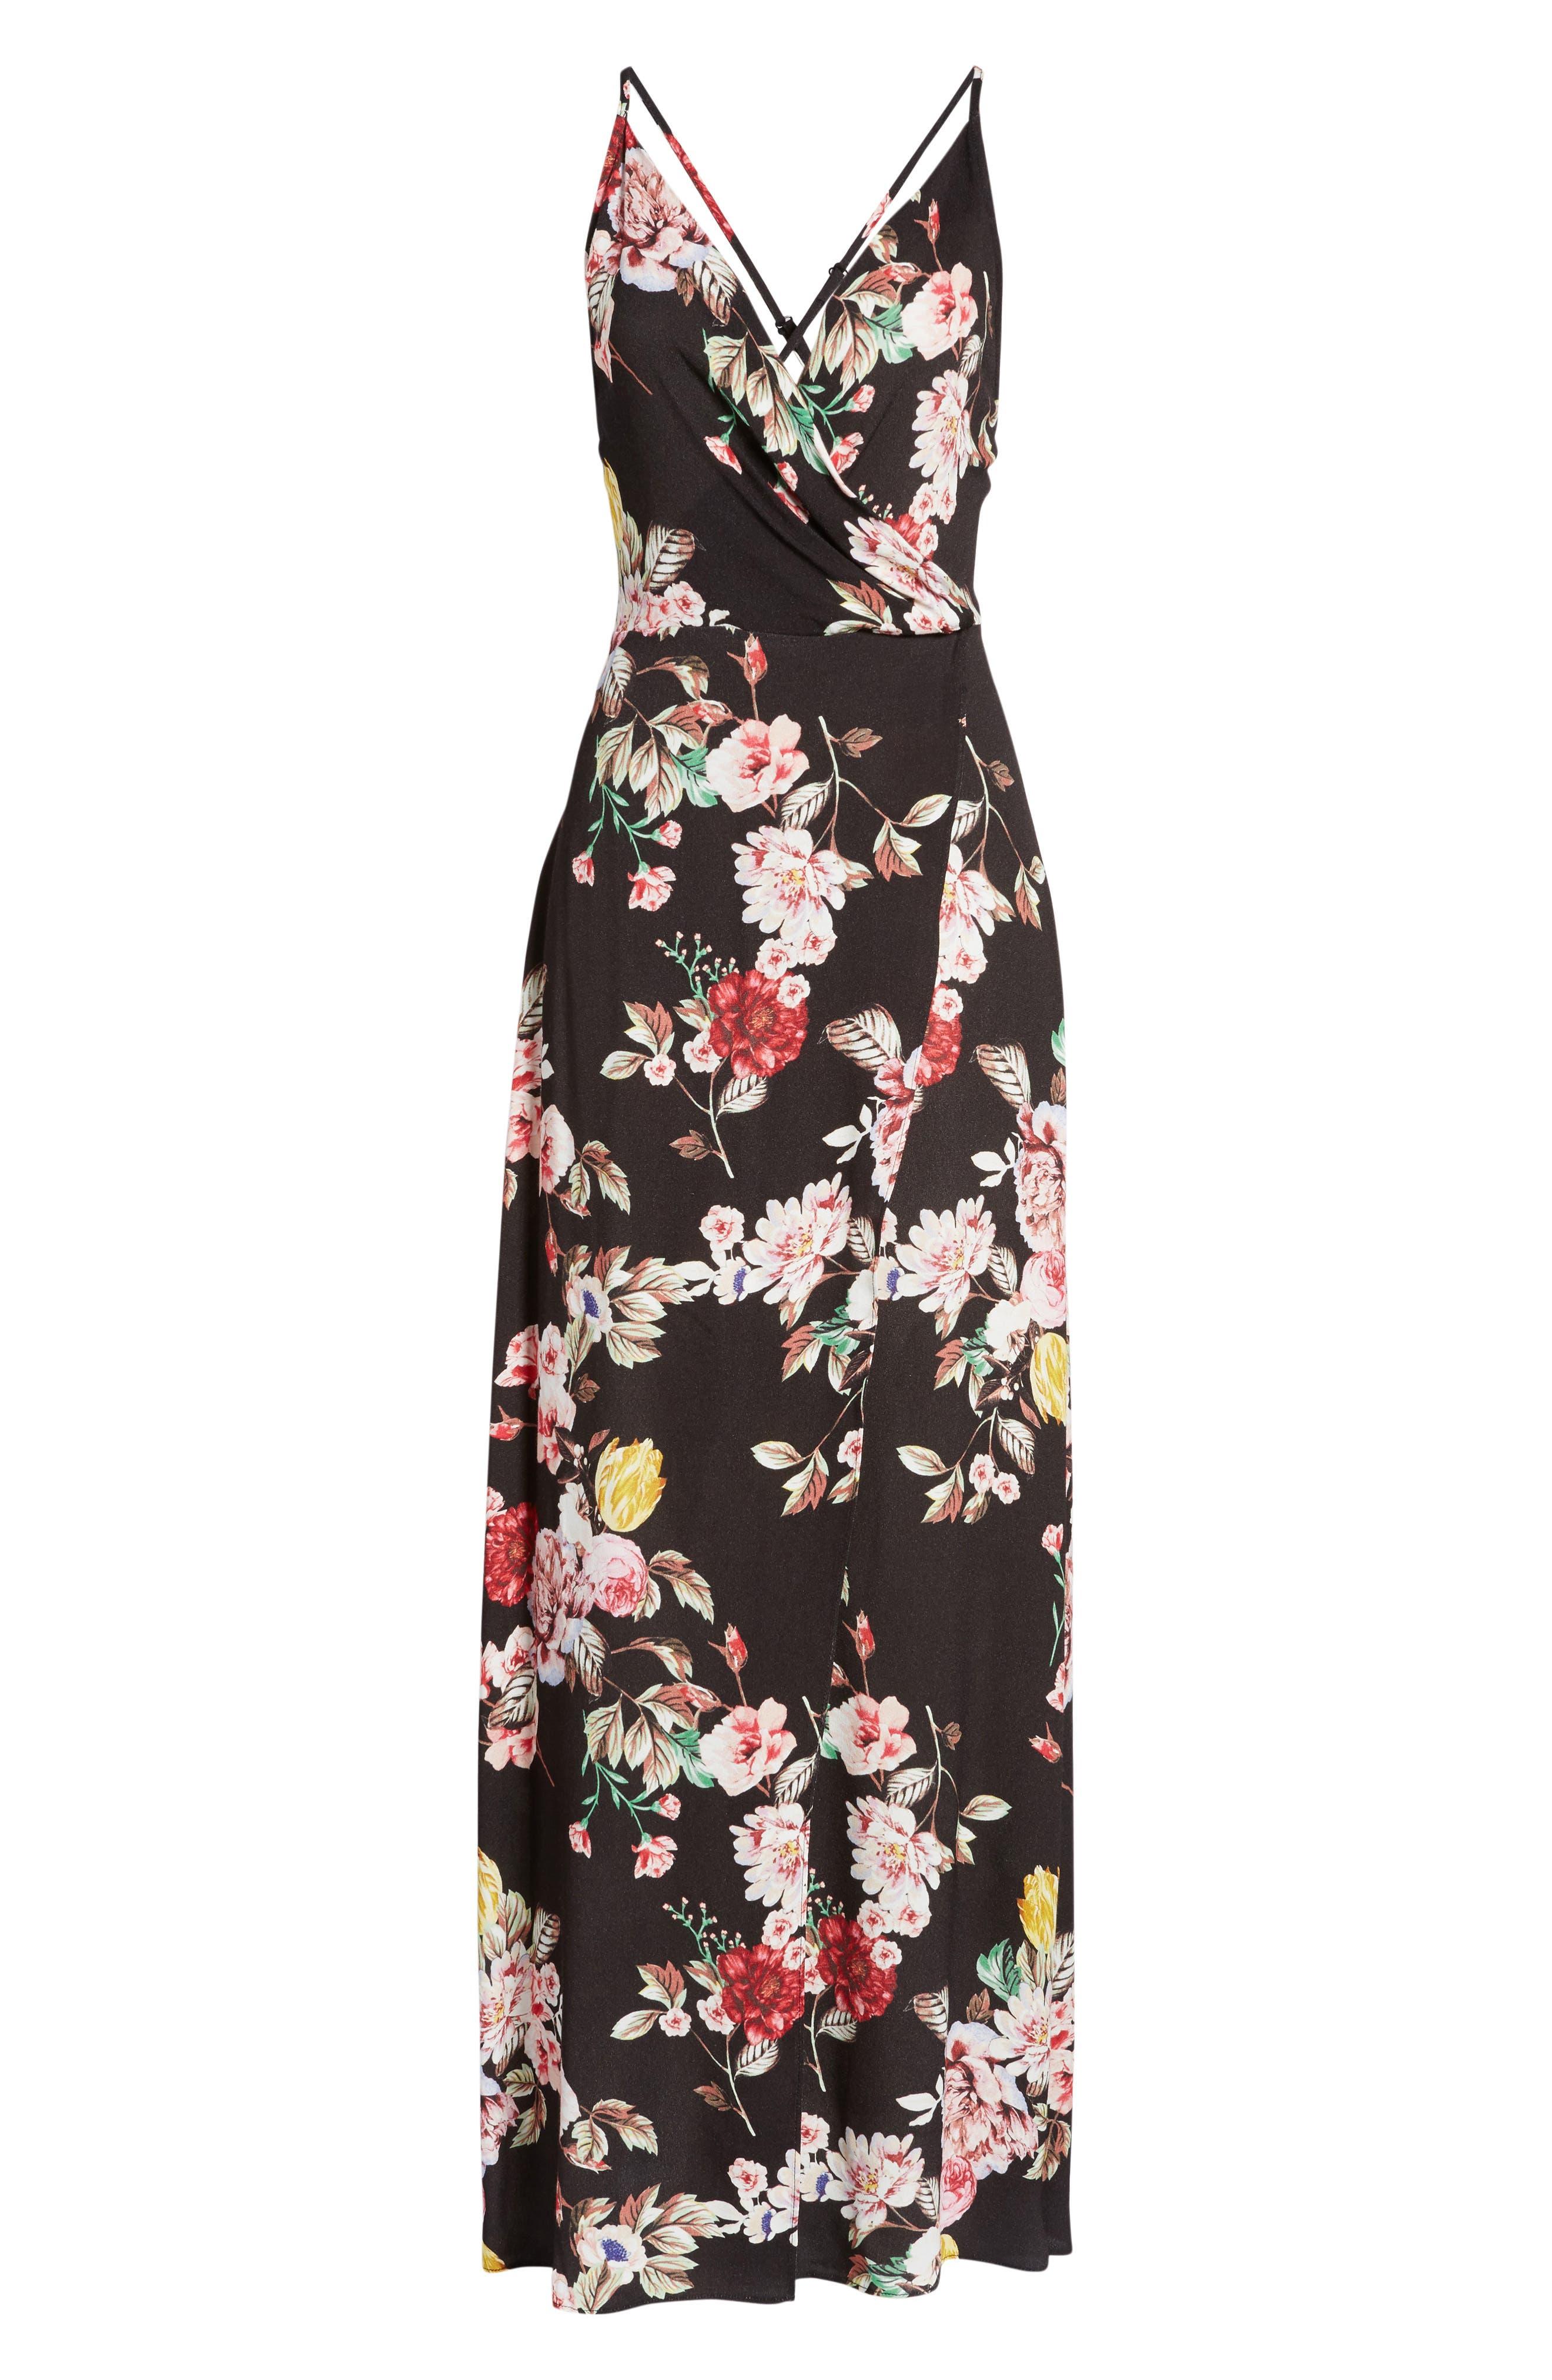 Kinsely Faux-Wrap Maxi Dress,                             Alternate thumbnail 6, color,                             002